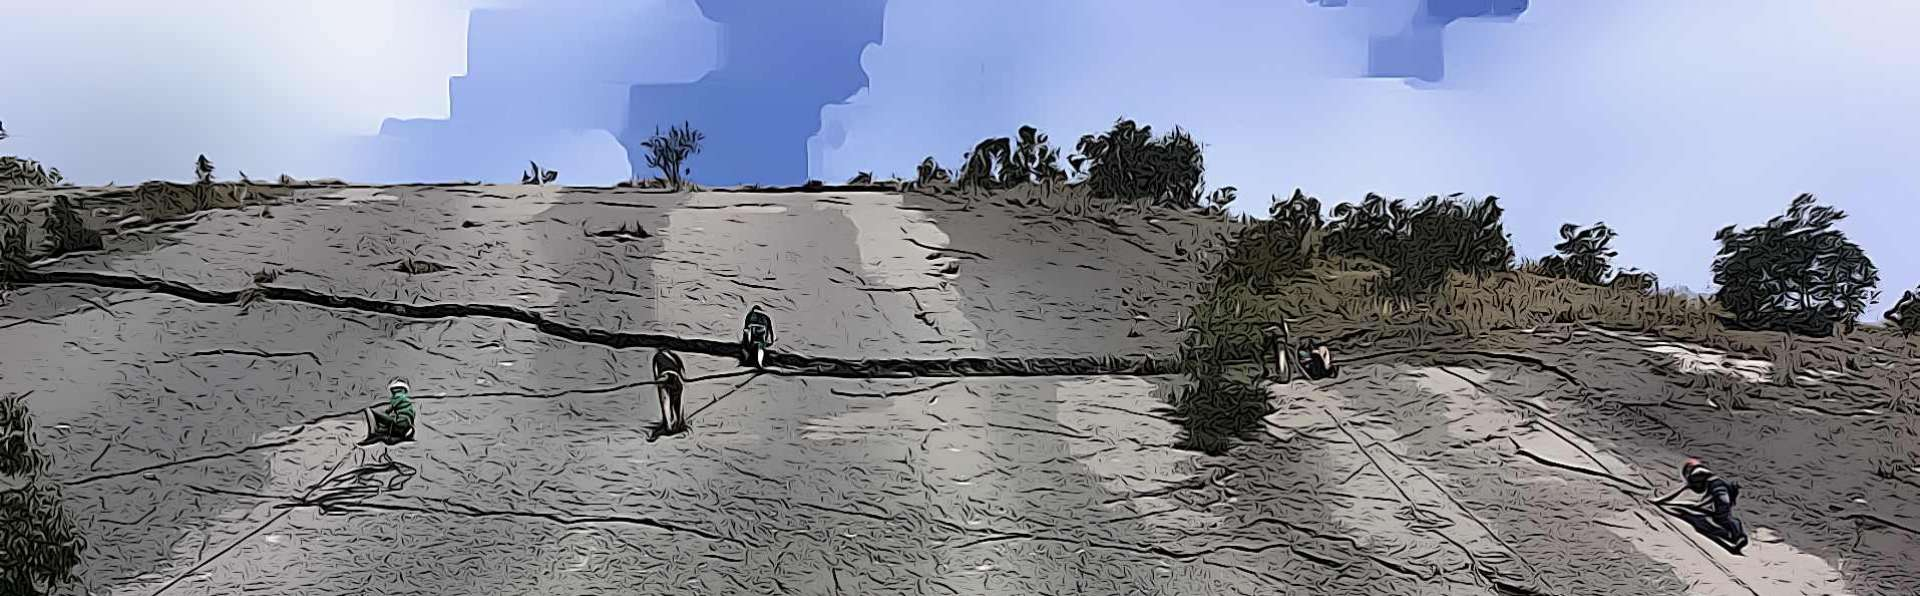 Paraclimbing